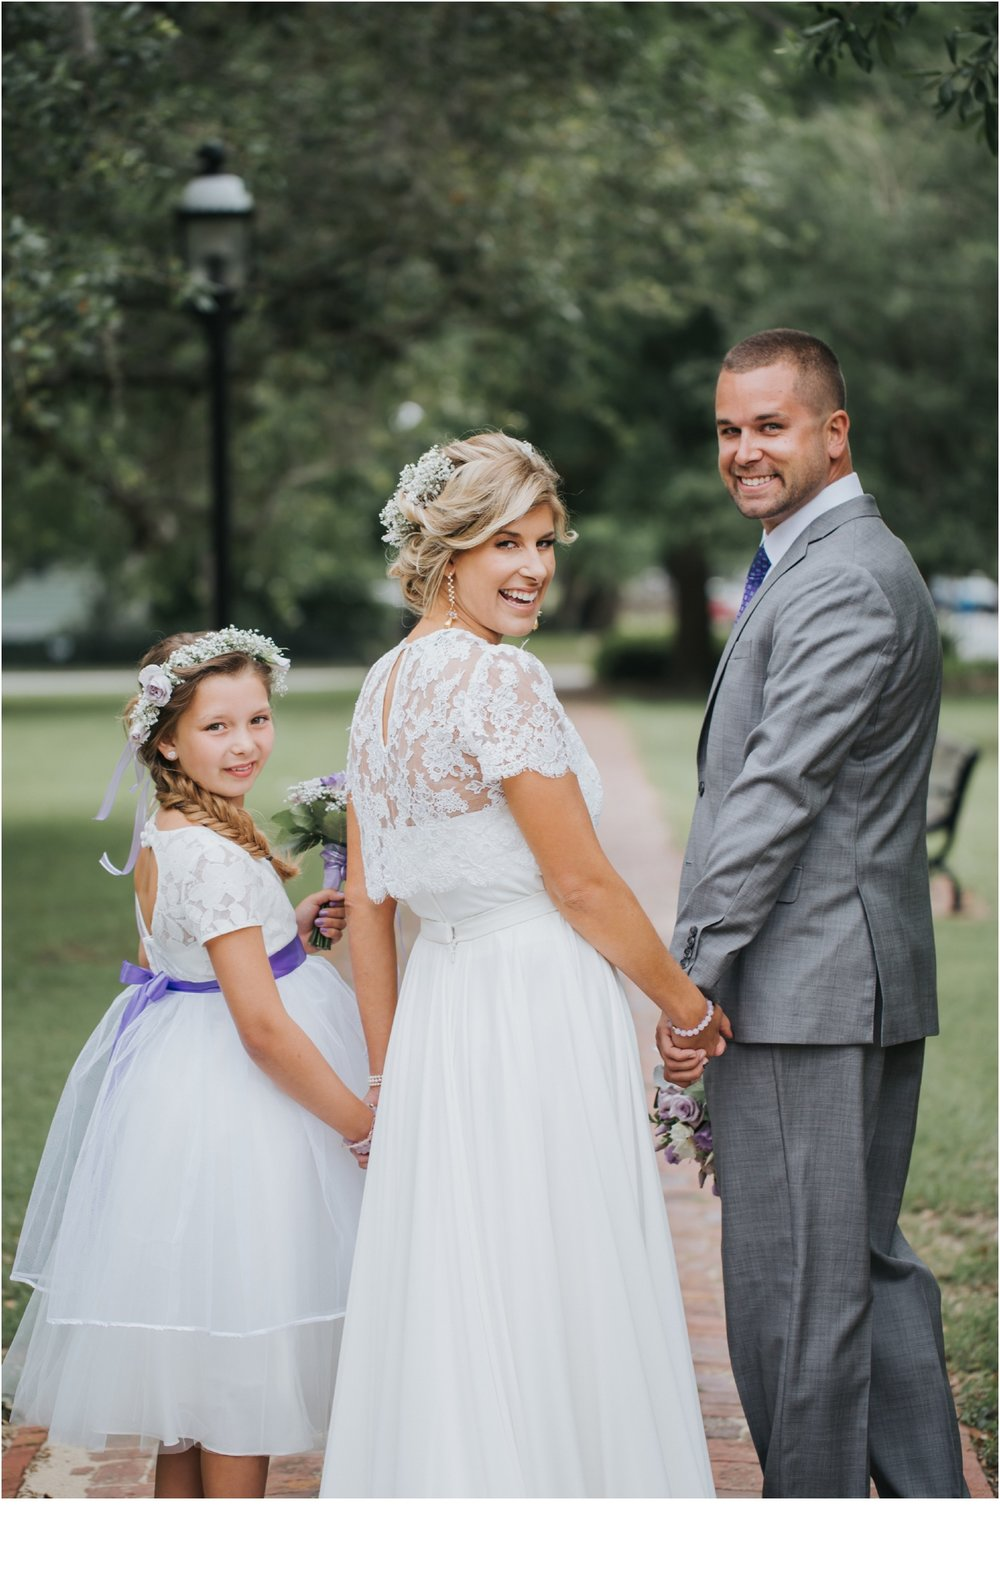 Rainey_Gregg_Photography_St._Simons_Island_Georgia_California_Wedding_Portrait_Photography_1503.jpg